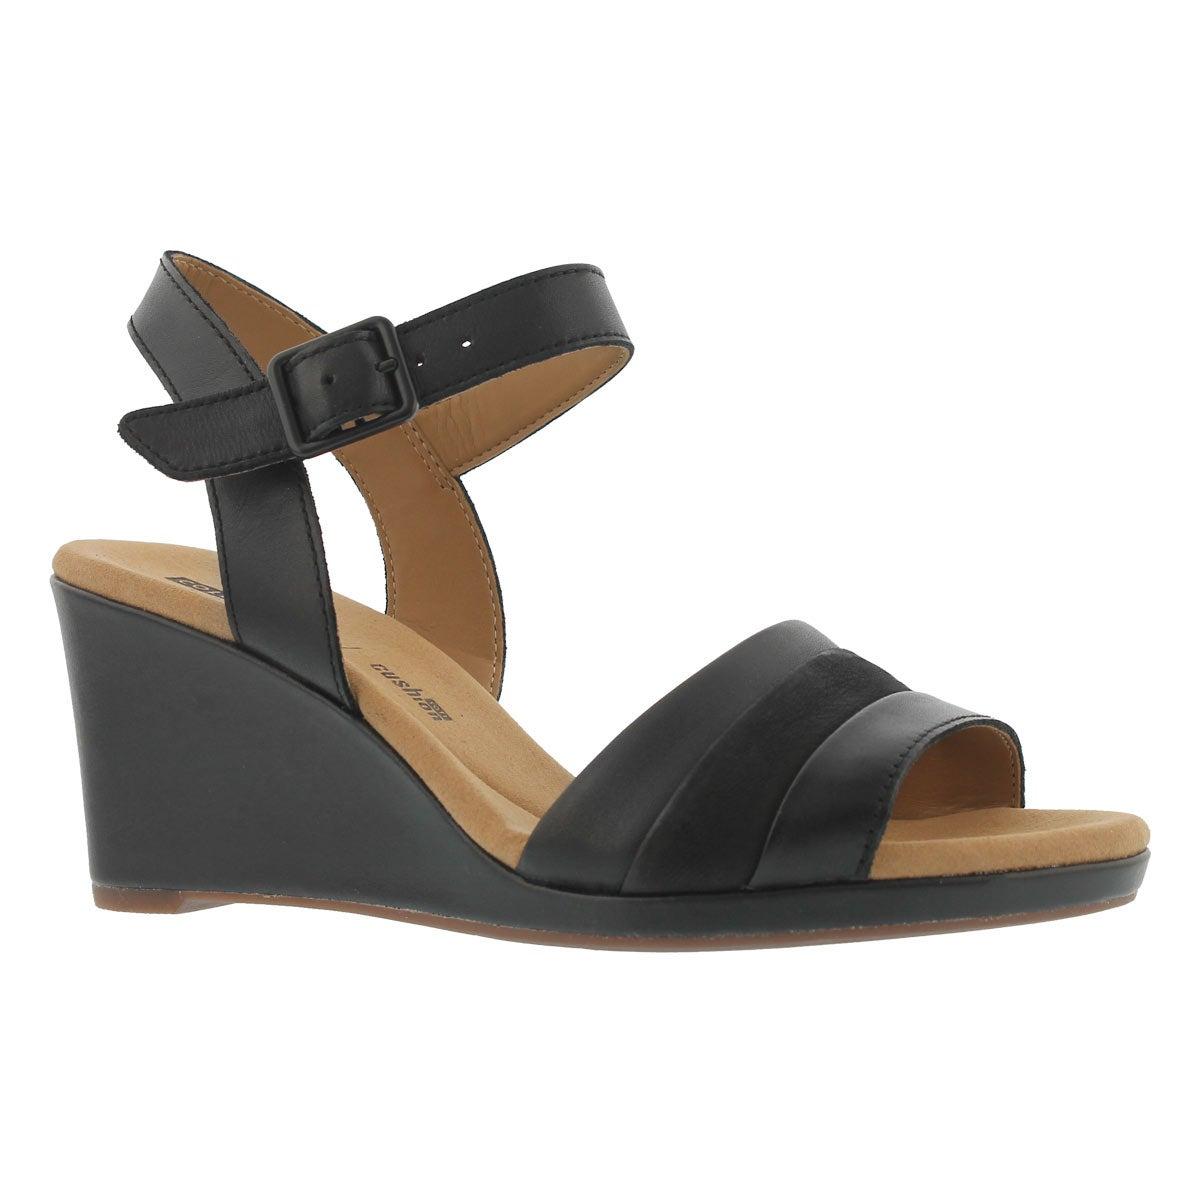 Women's LAFELY ALETHA black wedge sandals